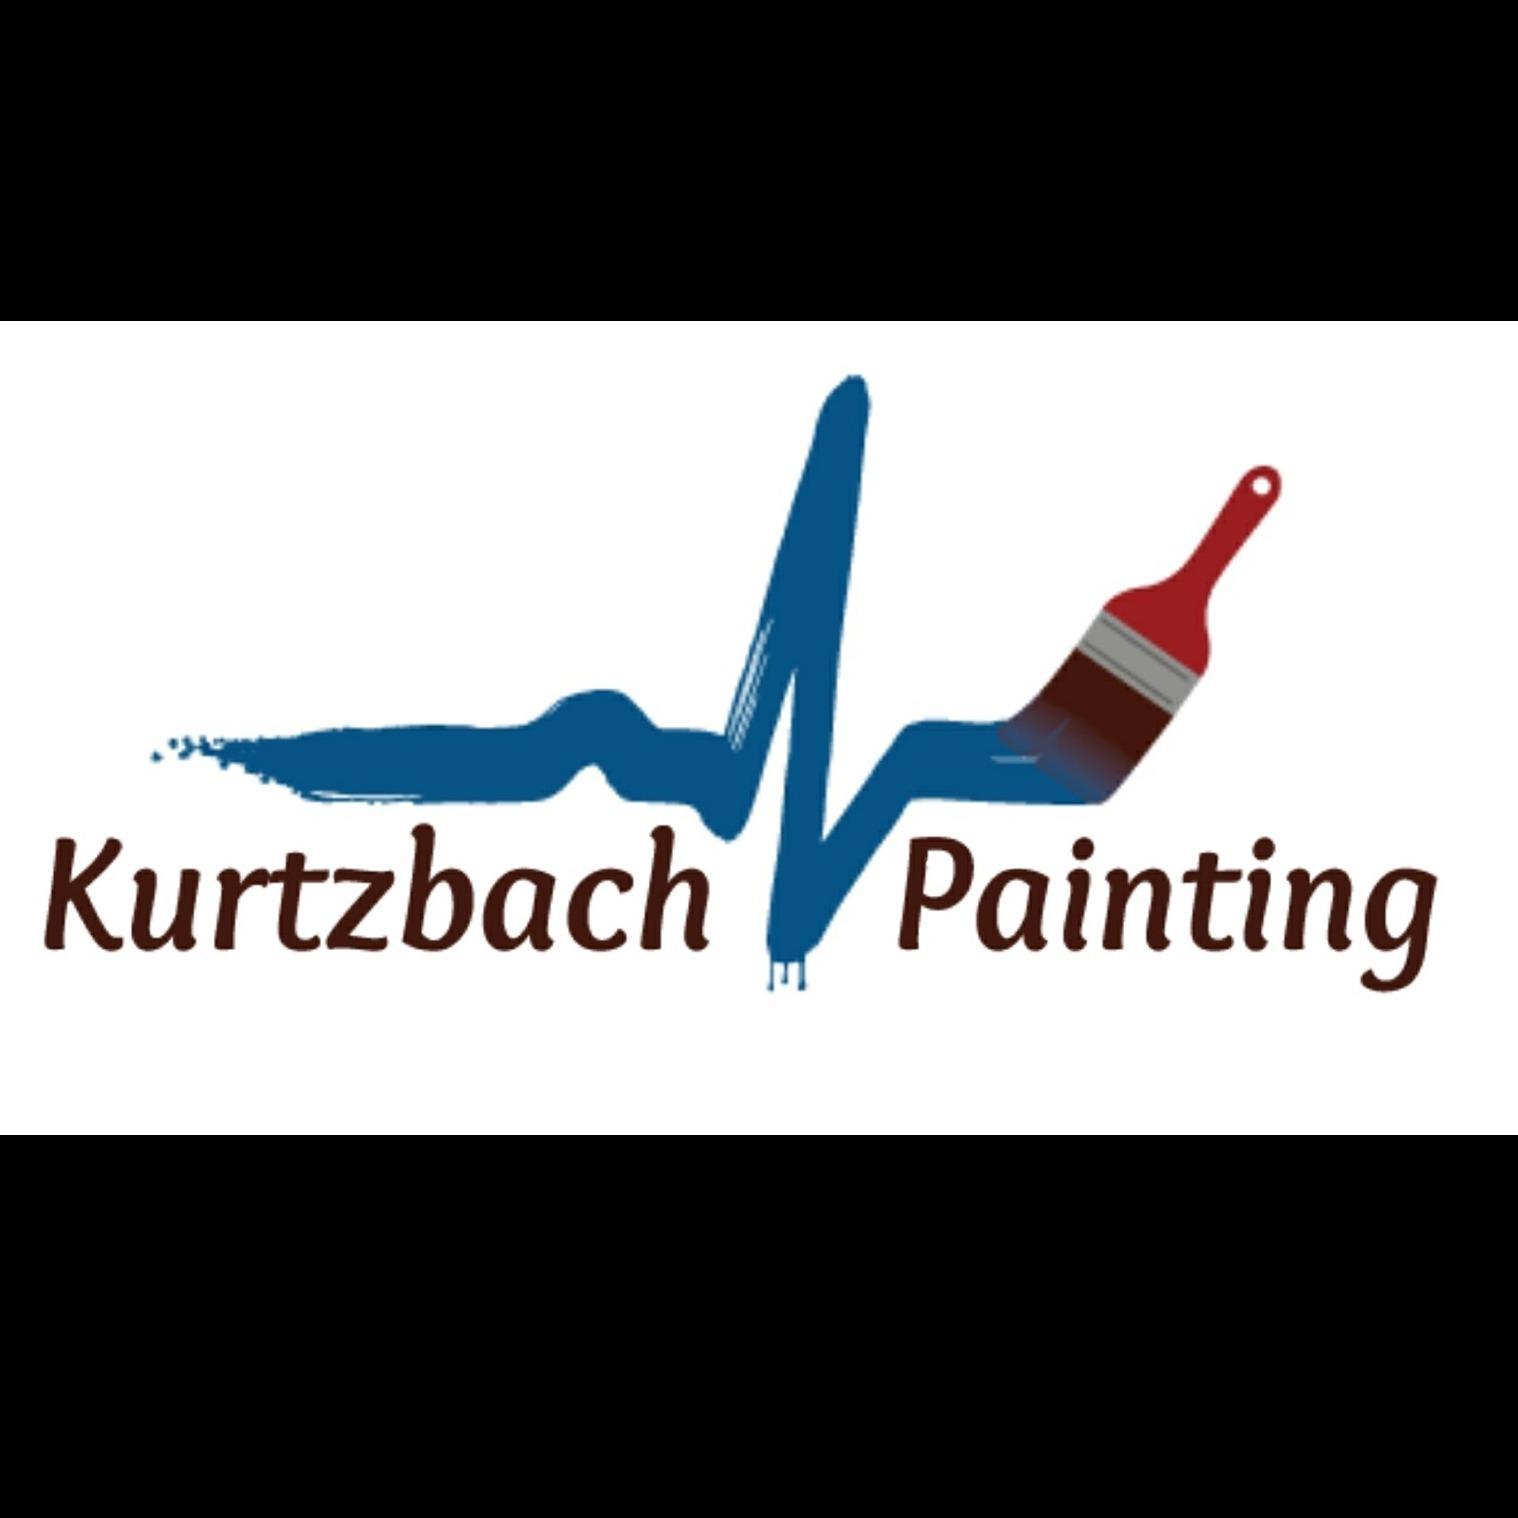 Kurtzbach Painting of Stillwater LLC